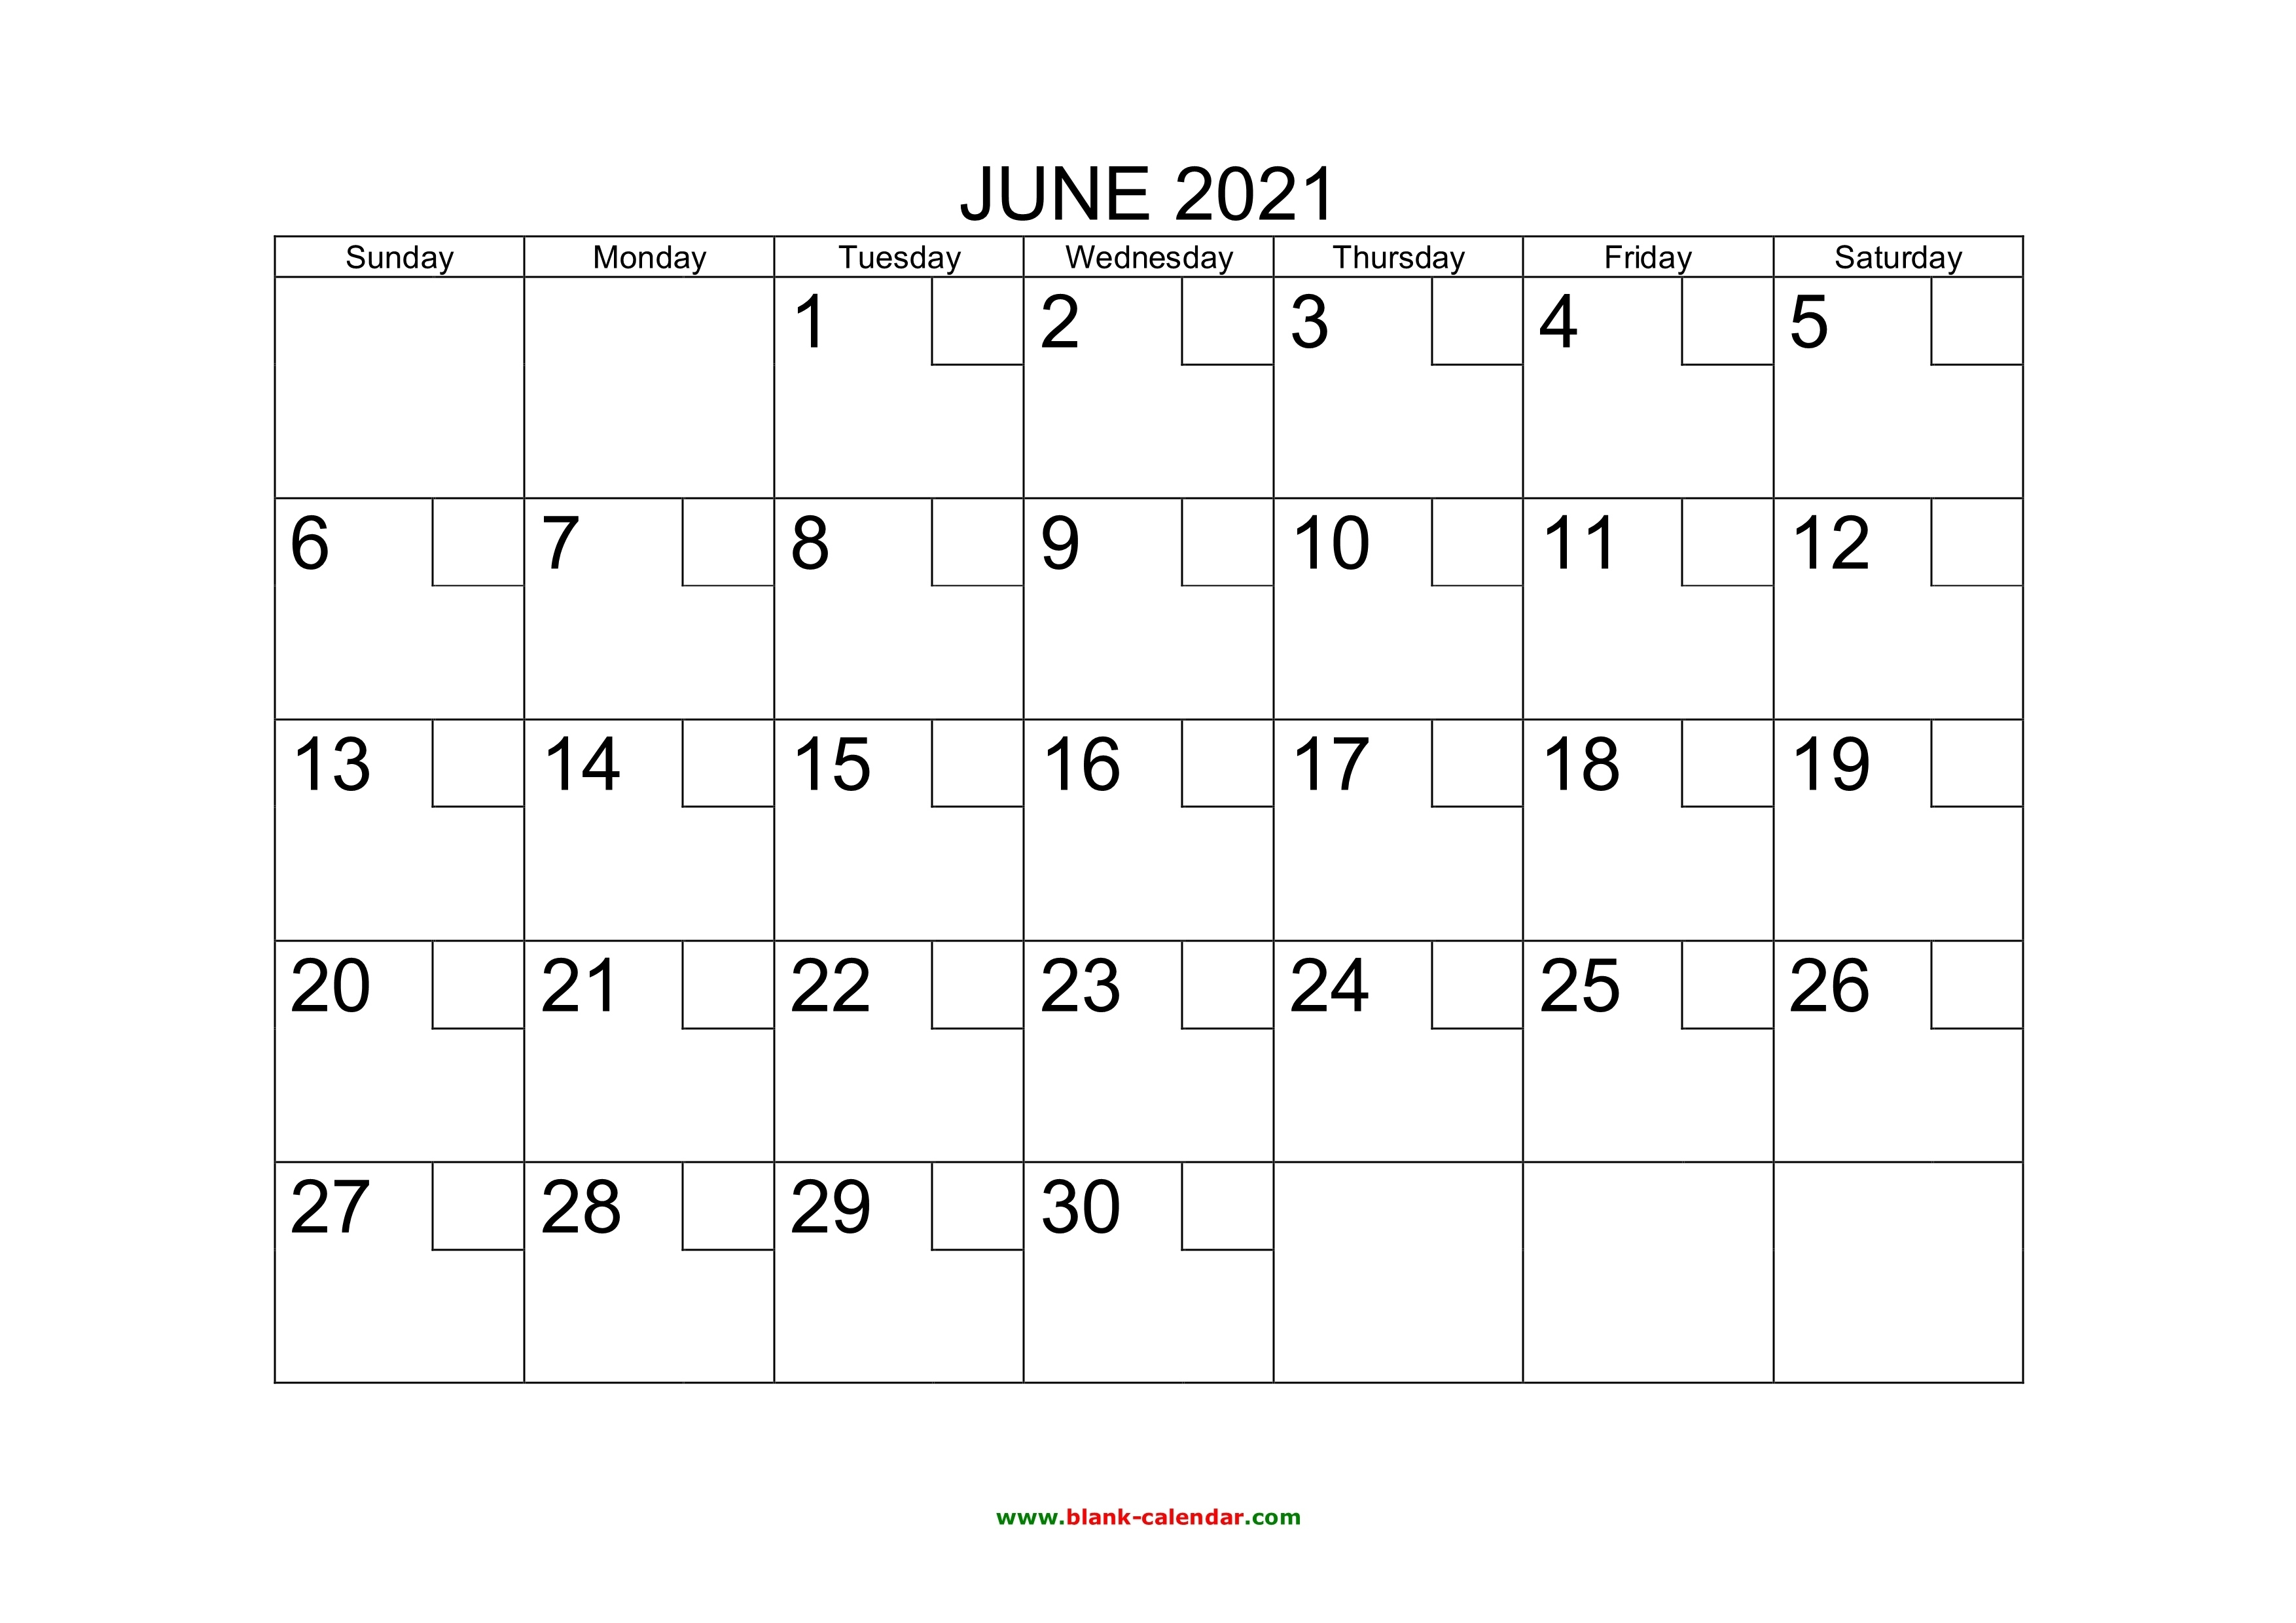 Free Download Printable June 2021 Calendar With Check Boxes June 2021 Blank Calendar Printable